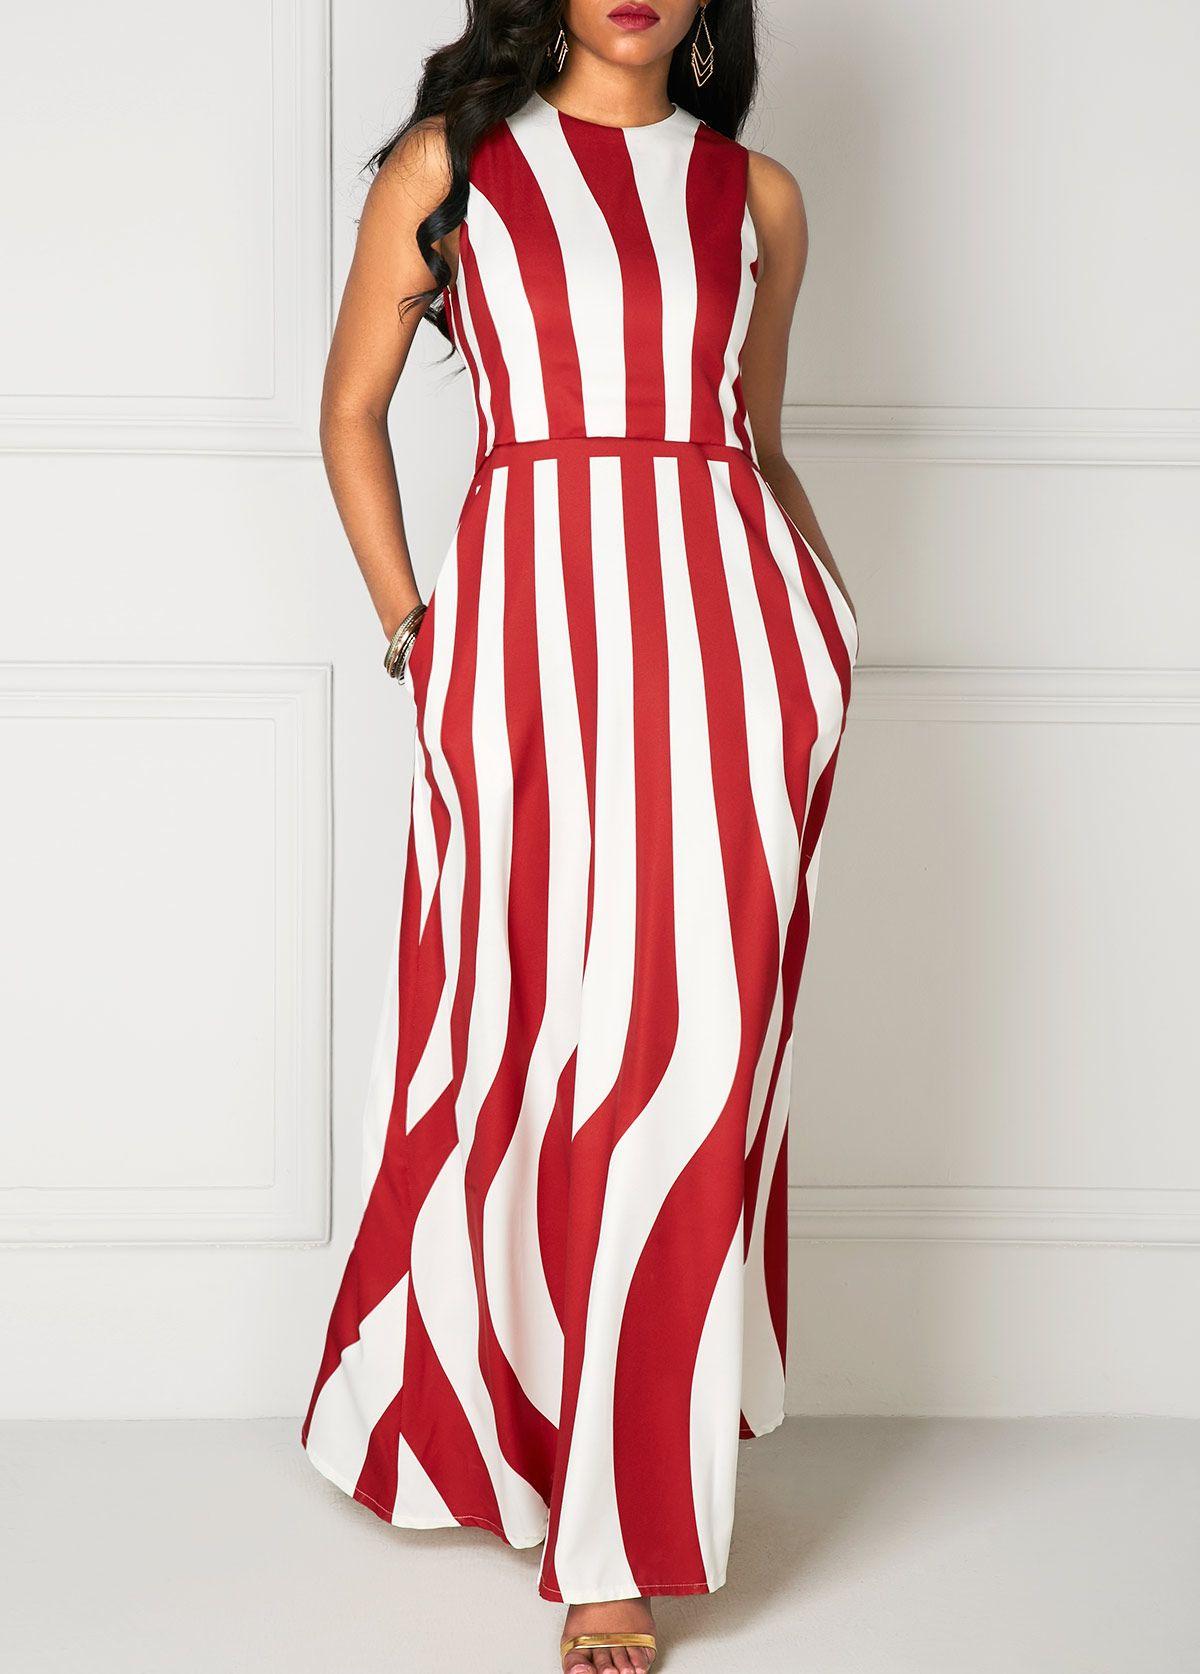 Pocket Round Neck Sleeveless High Waist Maxi Dress